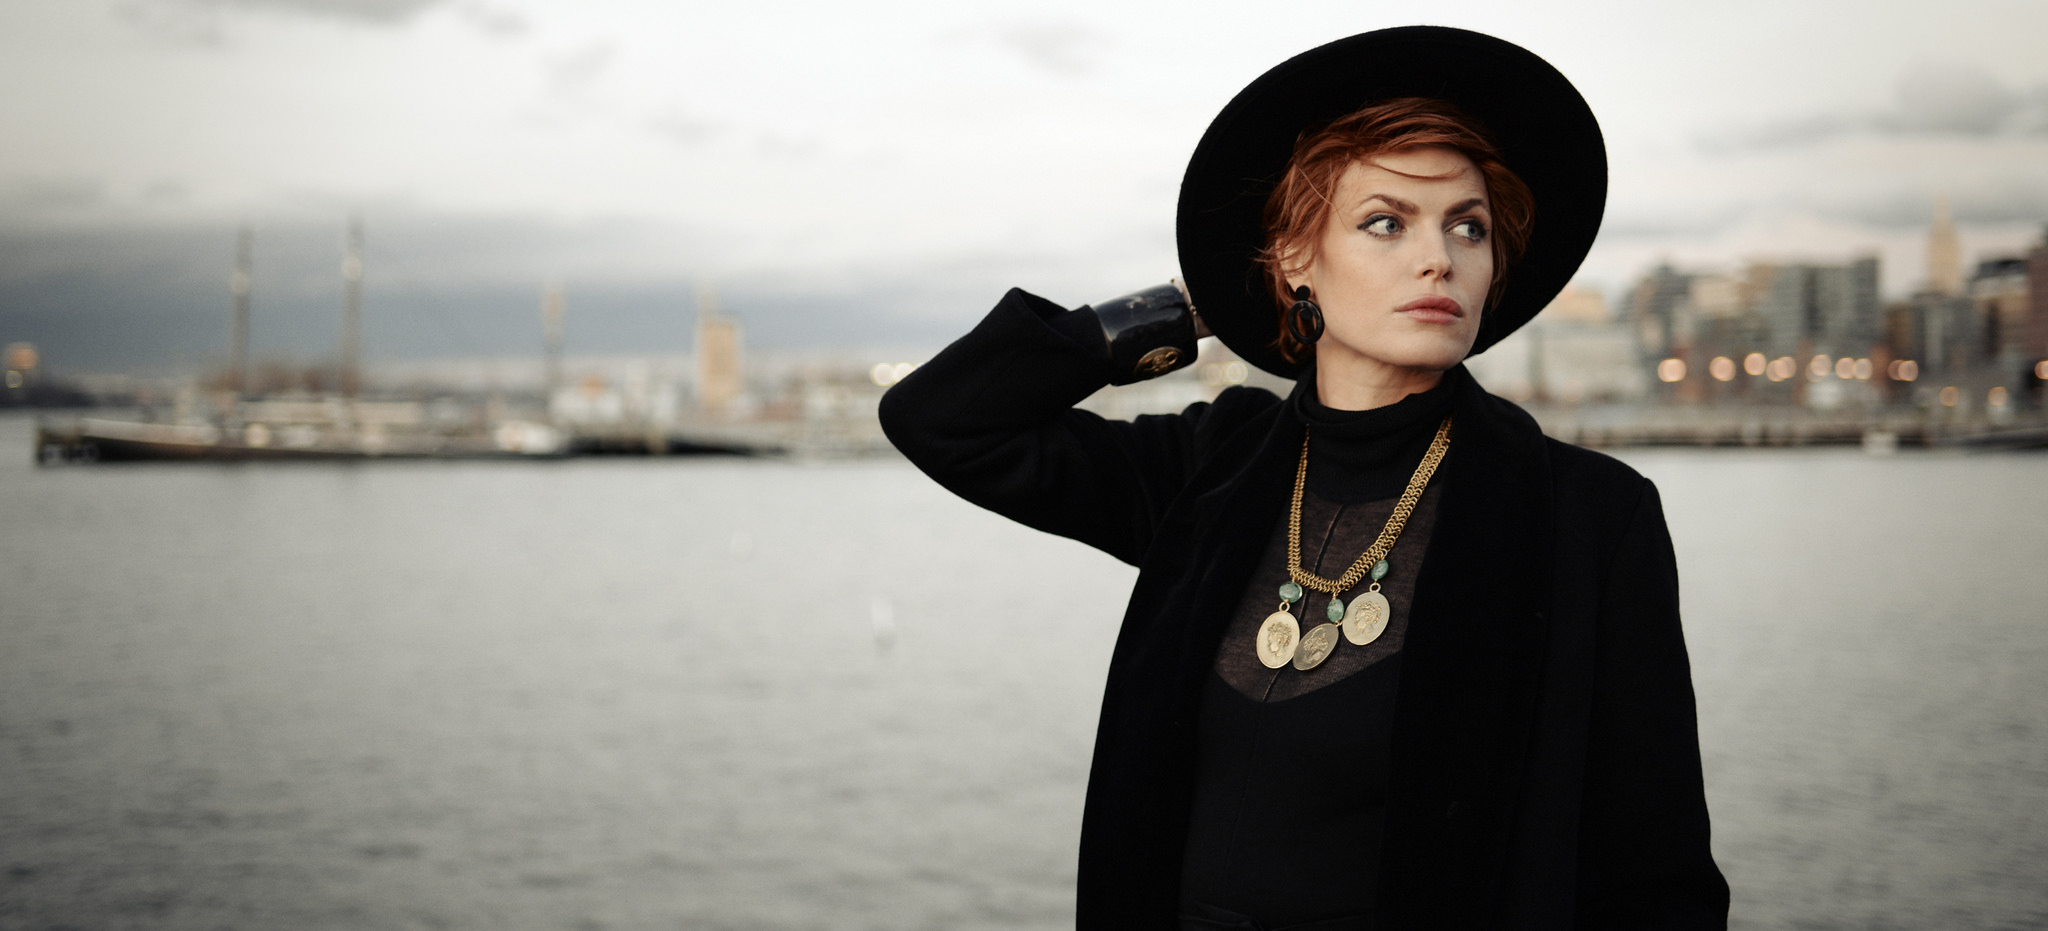 Christina wearing Cameo Cuff & Necklace with Nuba Earrings. Photo by Eftihia Stefanidi, New York